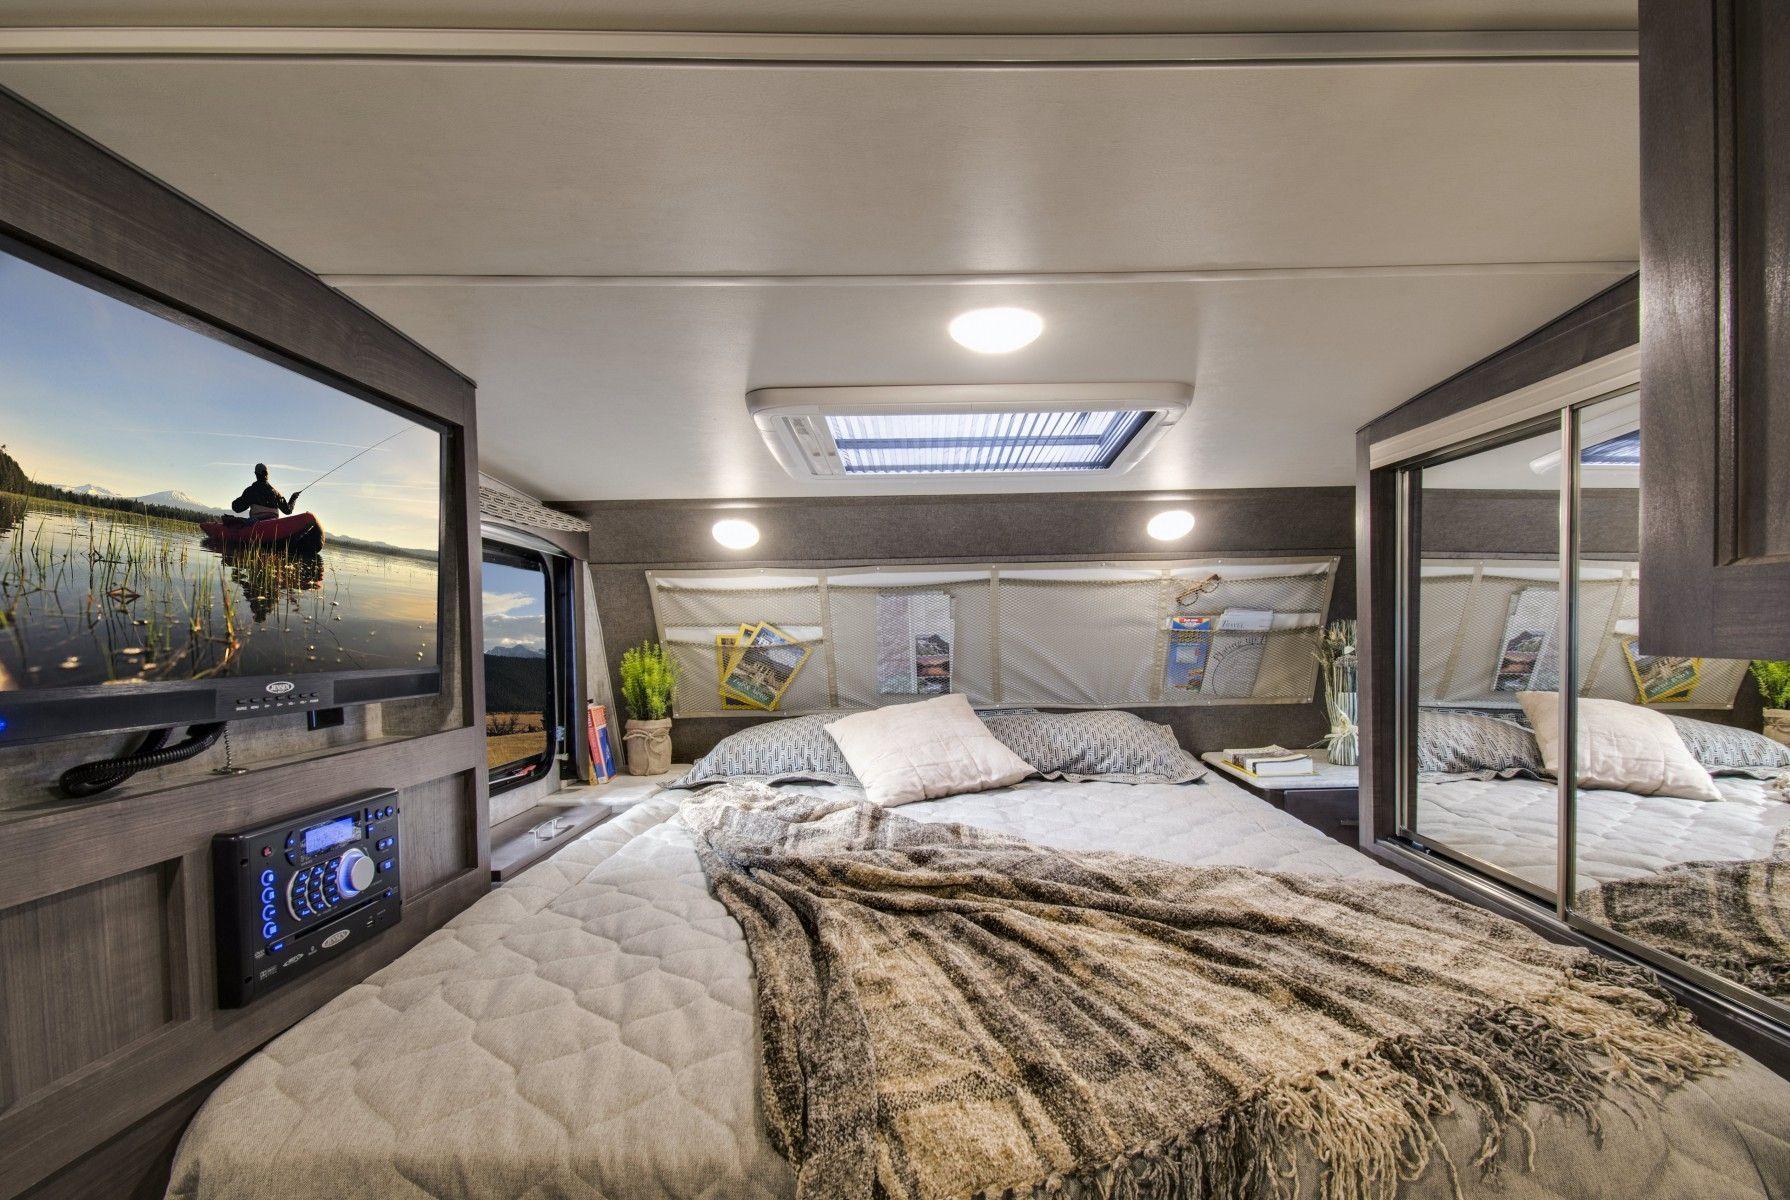 30 Amazing Picture of Camper Bedroom